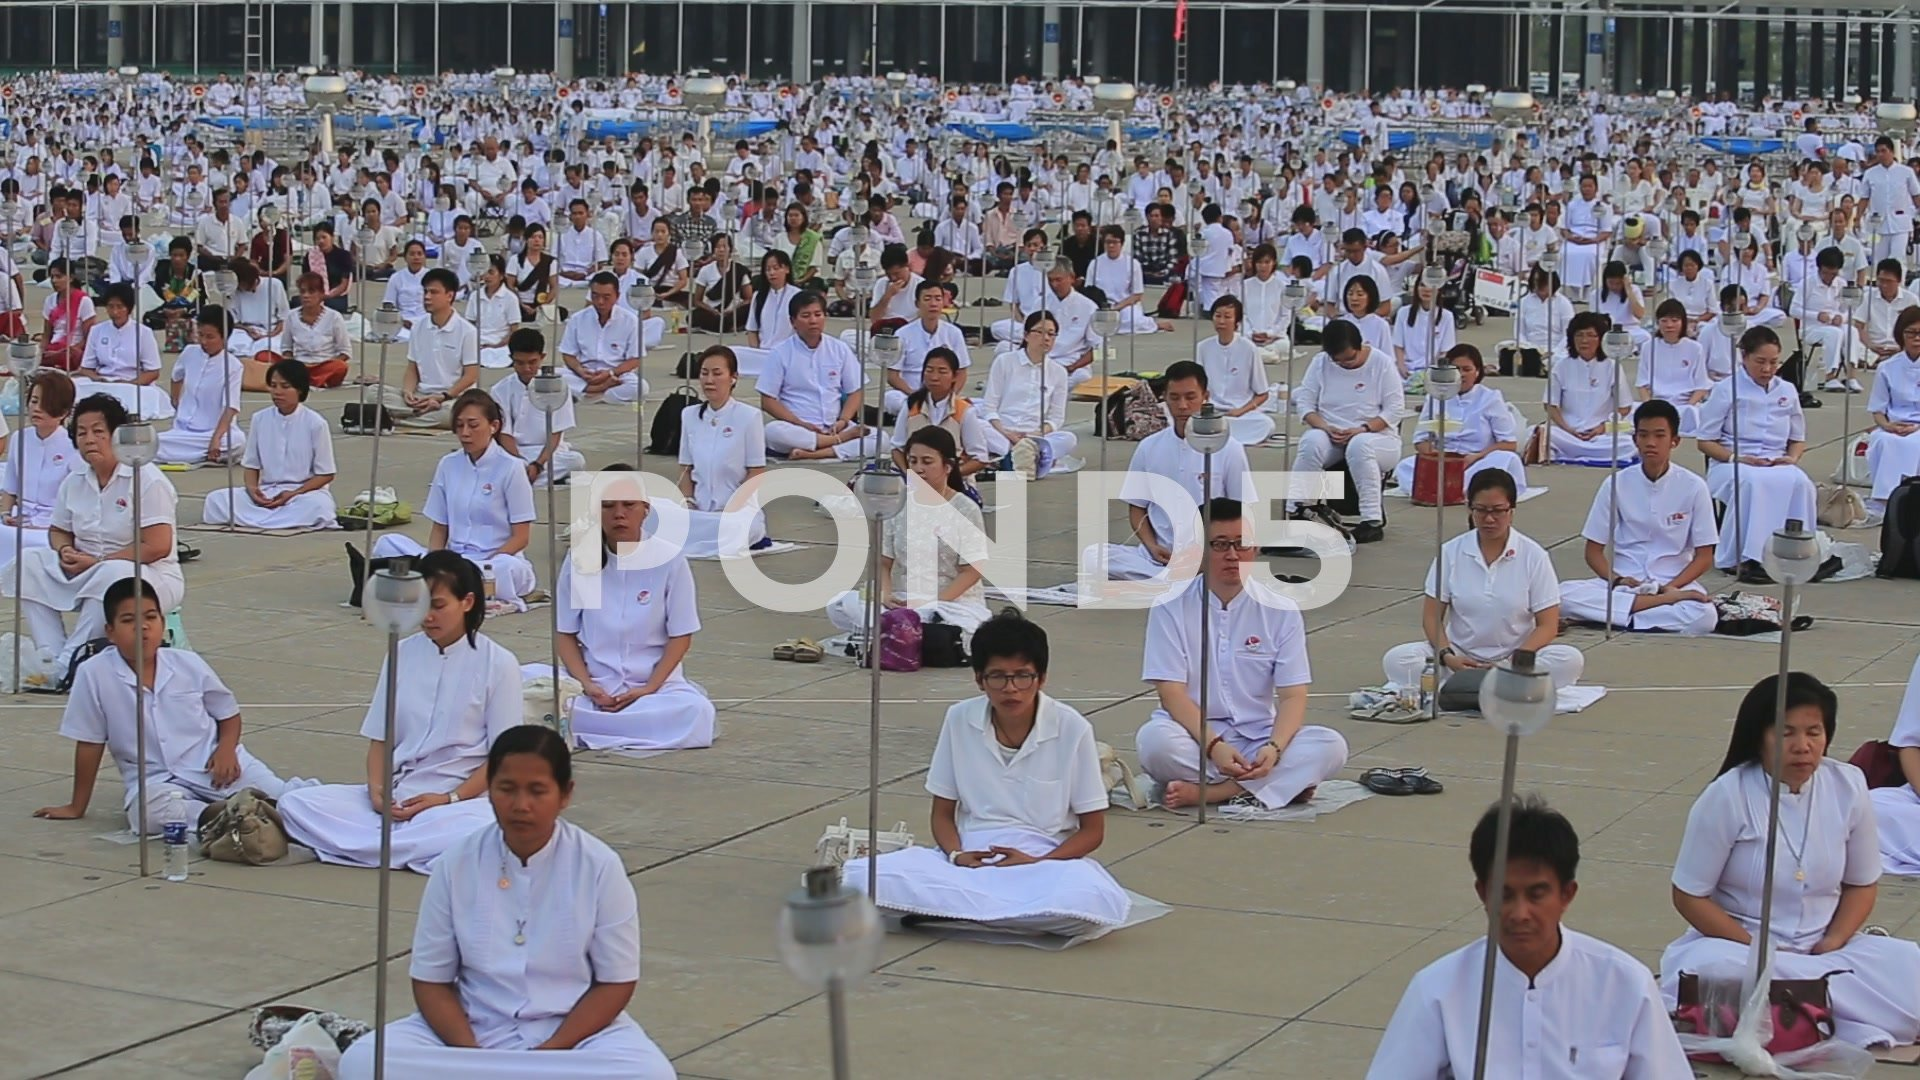 Buddhist ceremony Magha Puja Day in Wat Phra Dhammakaya Bangkok 1920x1080